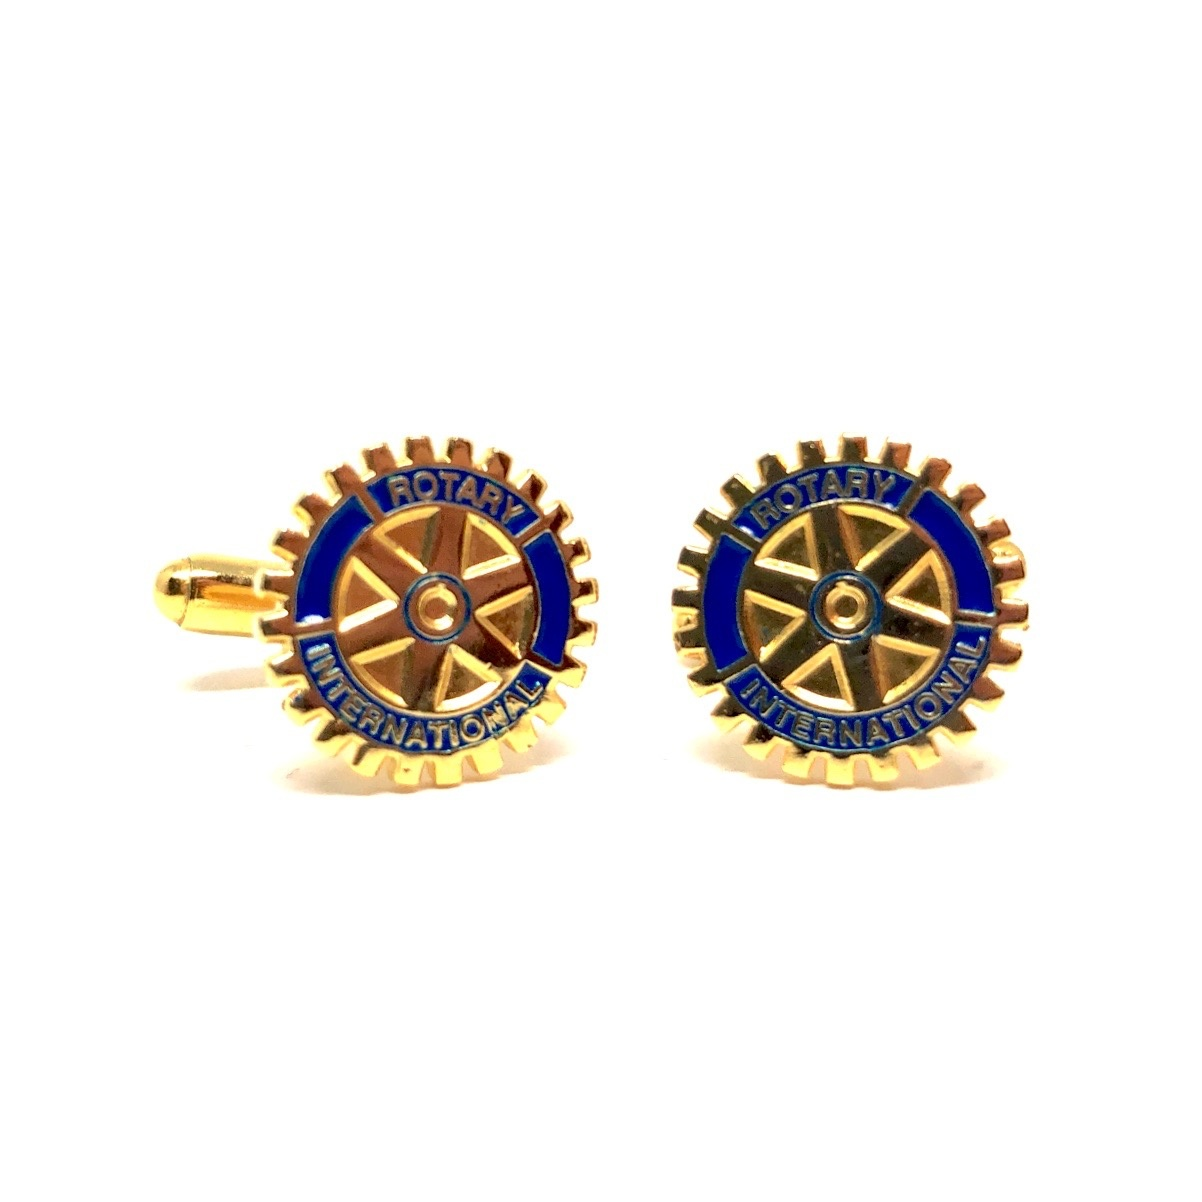 Manchetknopen Rotary